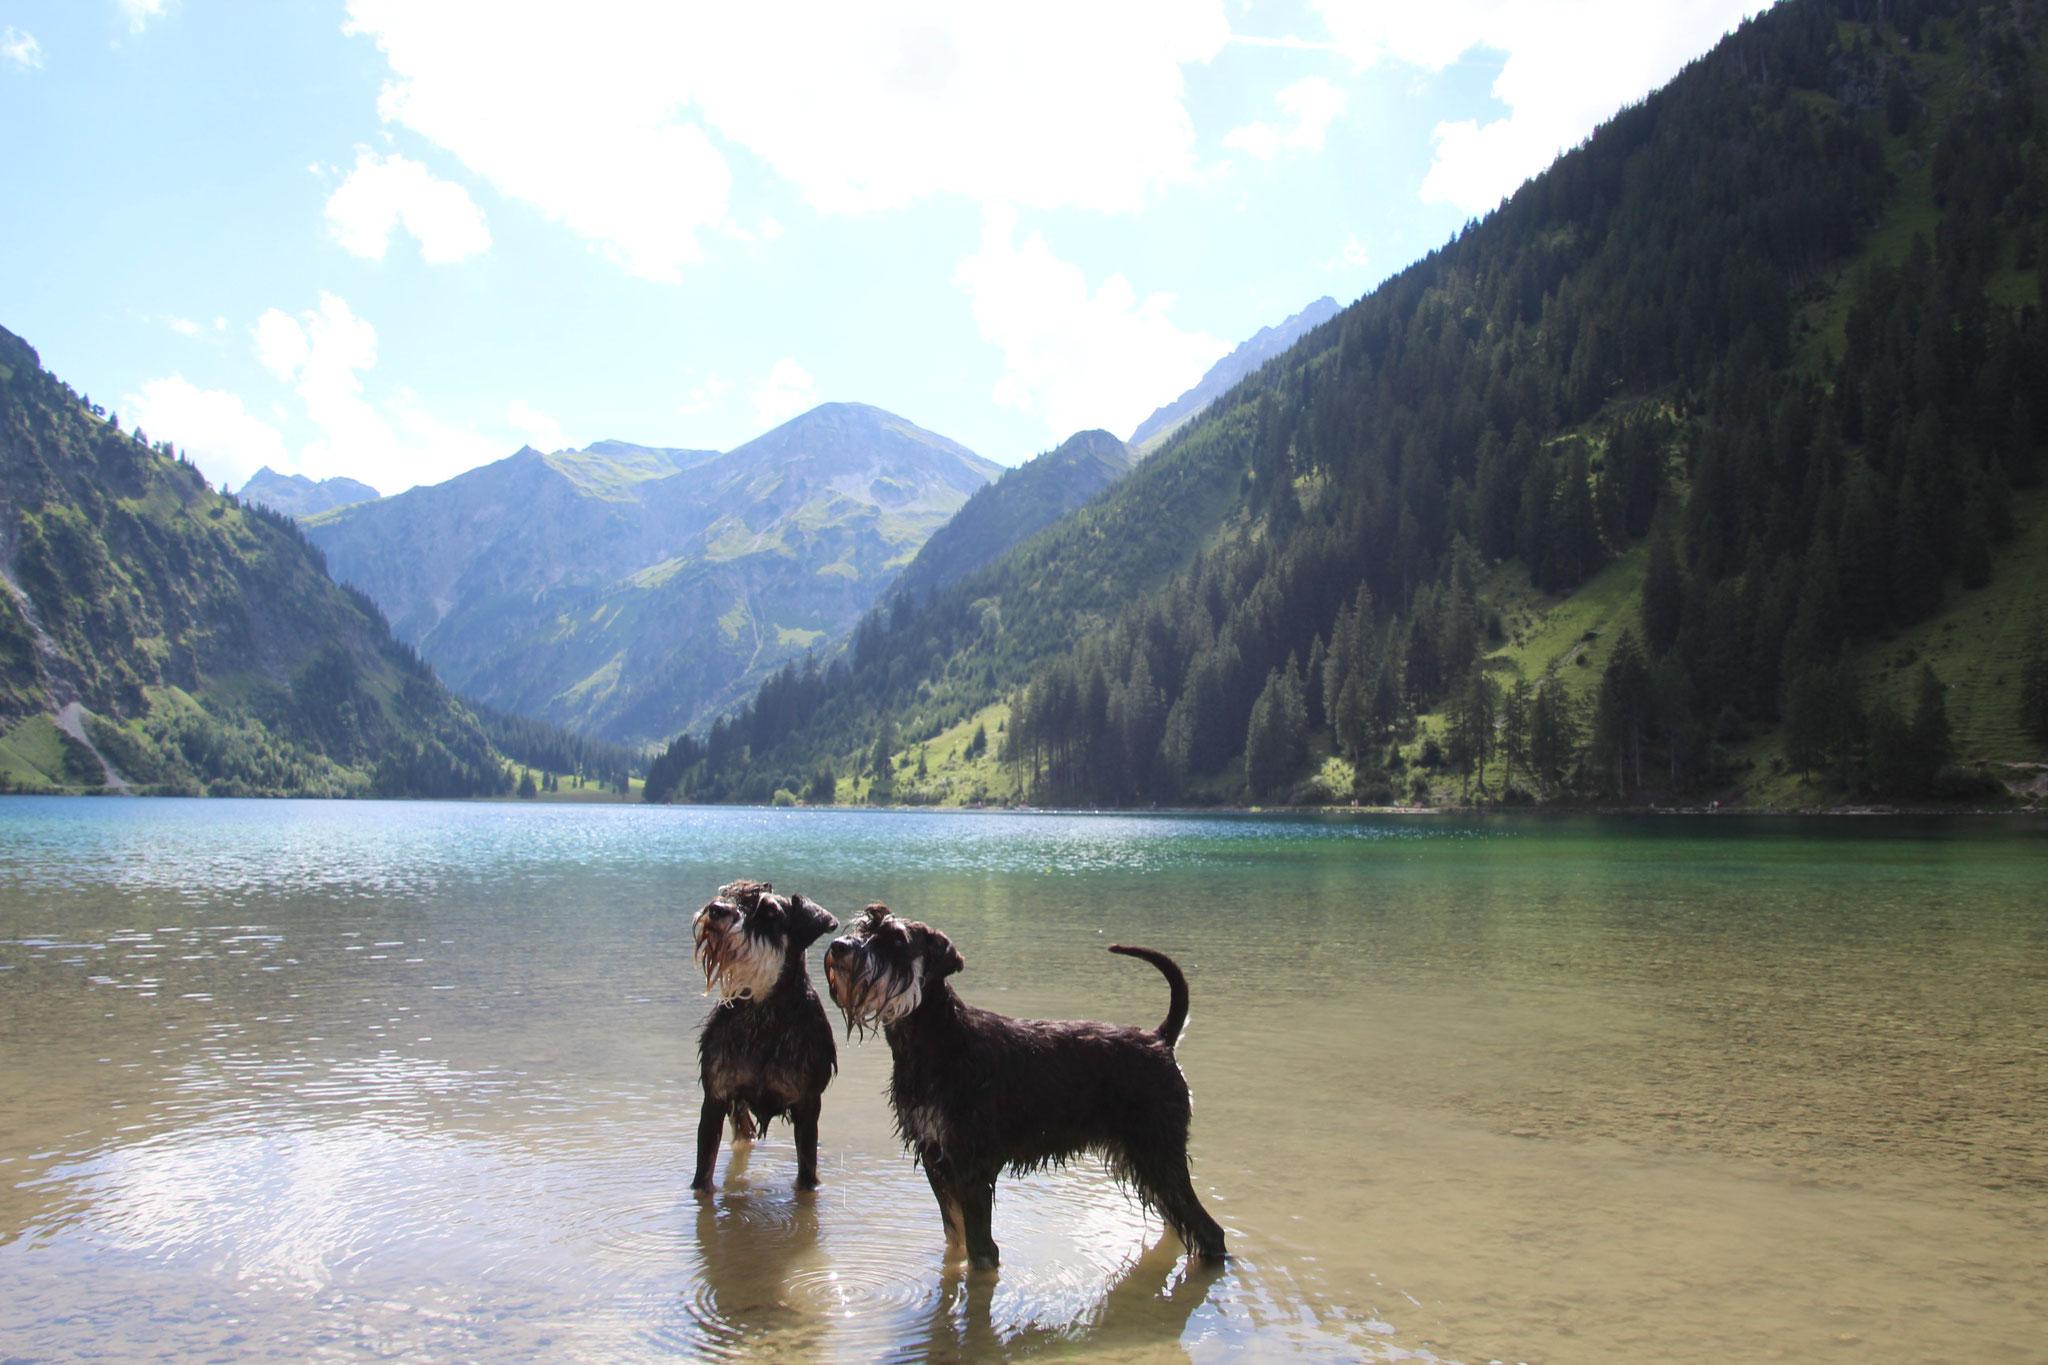 Brünni und Pia im Vilsalpsee, Tannheimer Tal